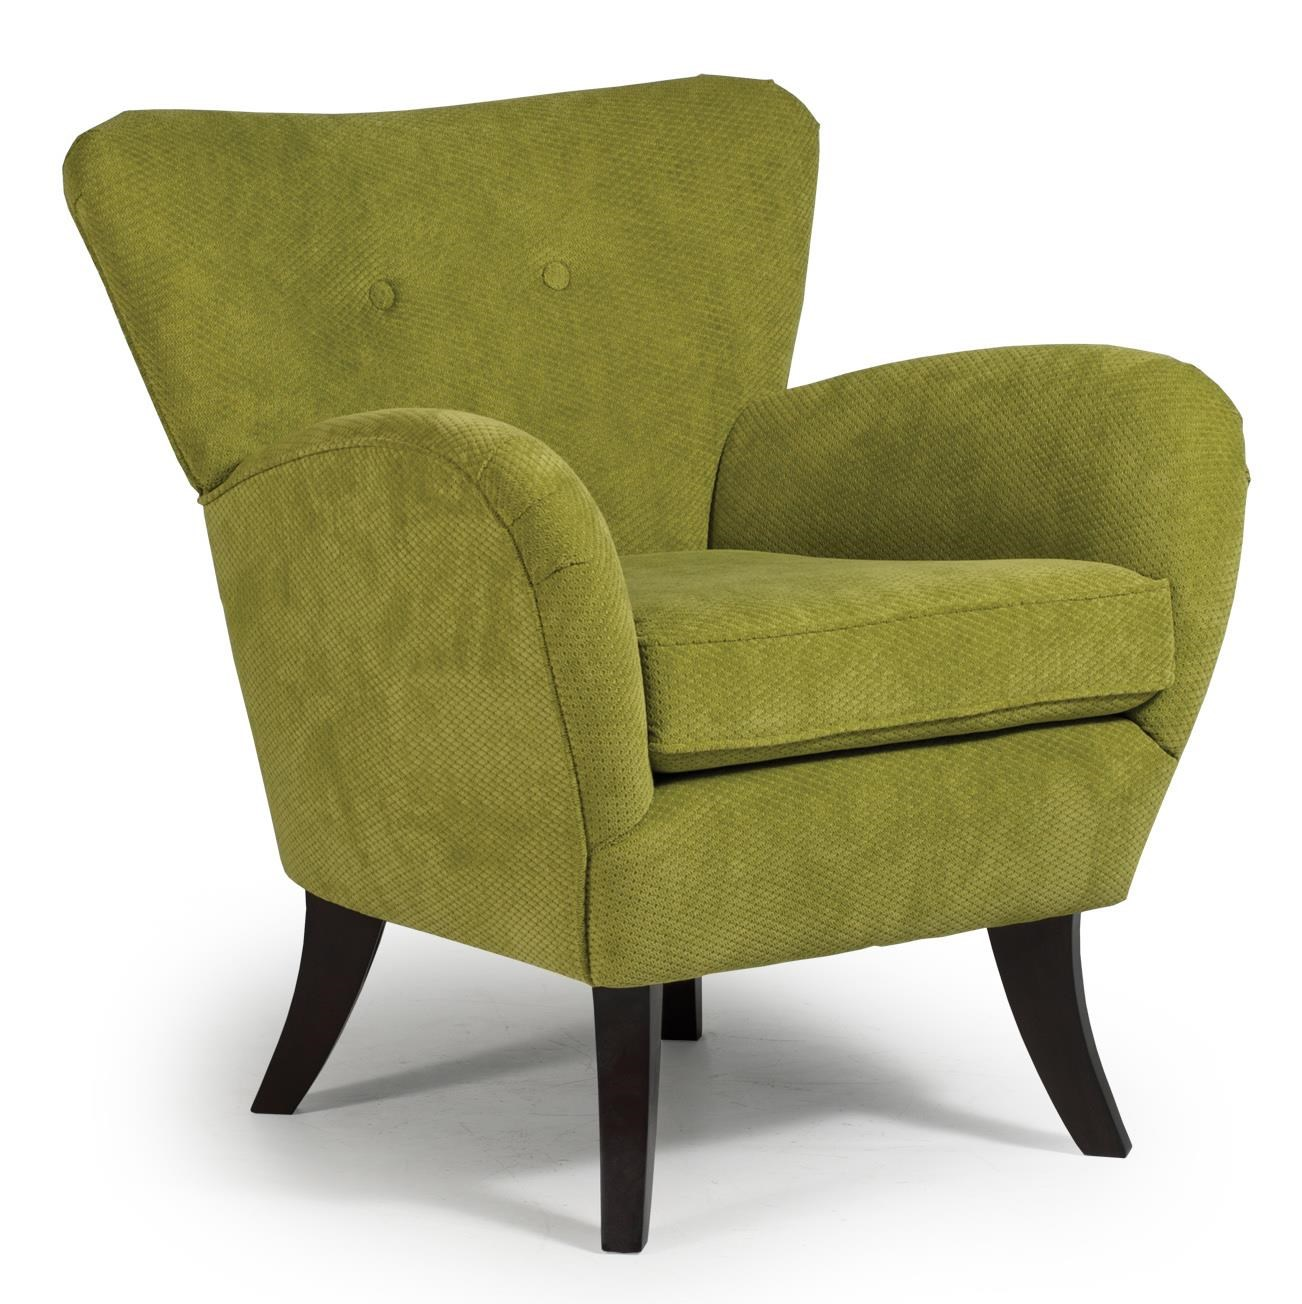 Ordinaire Walkeru0027s Furniture